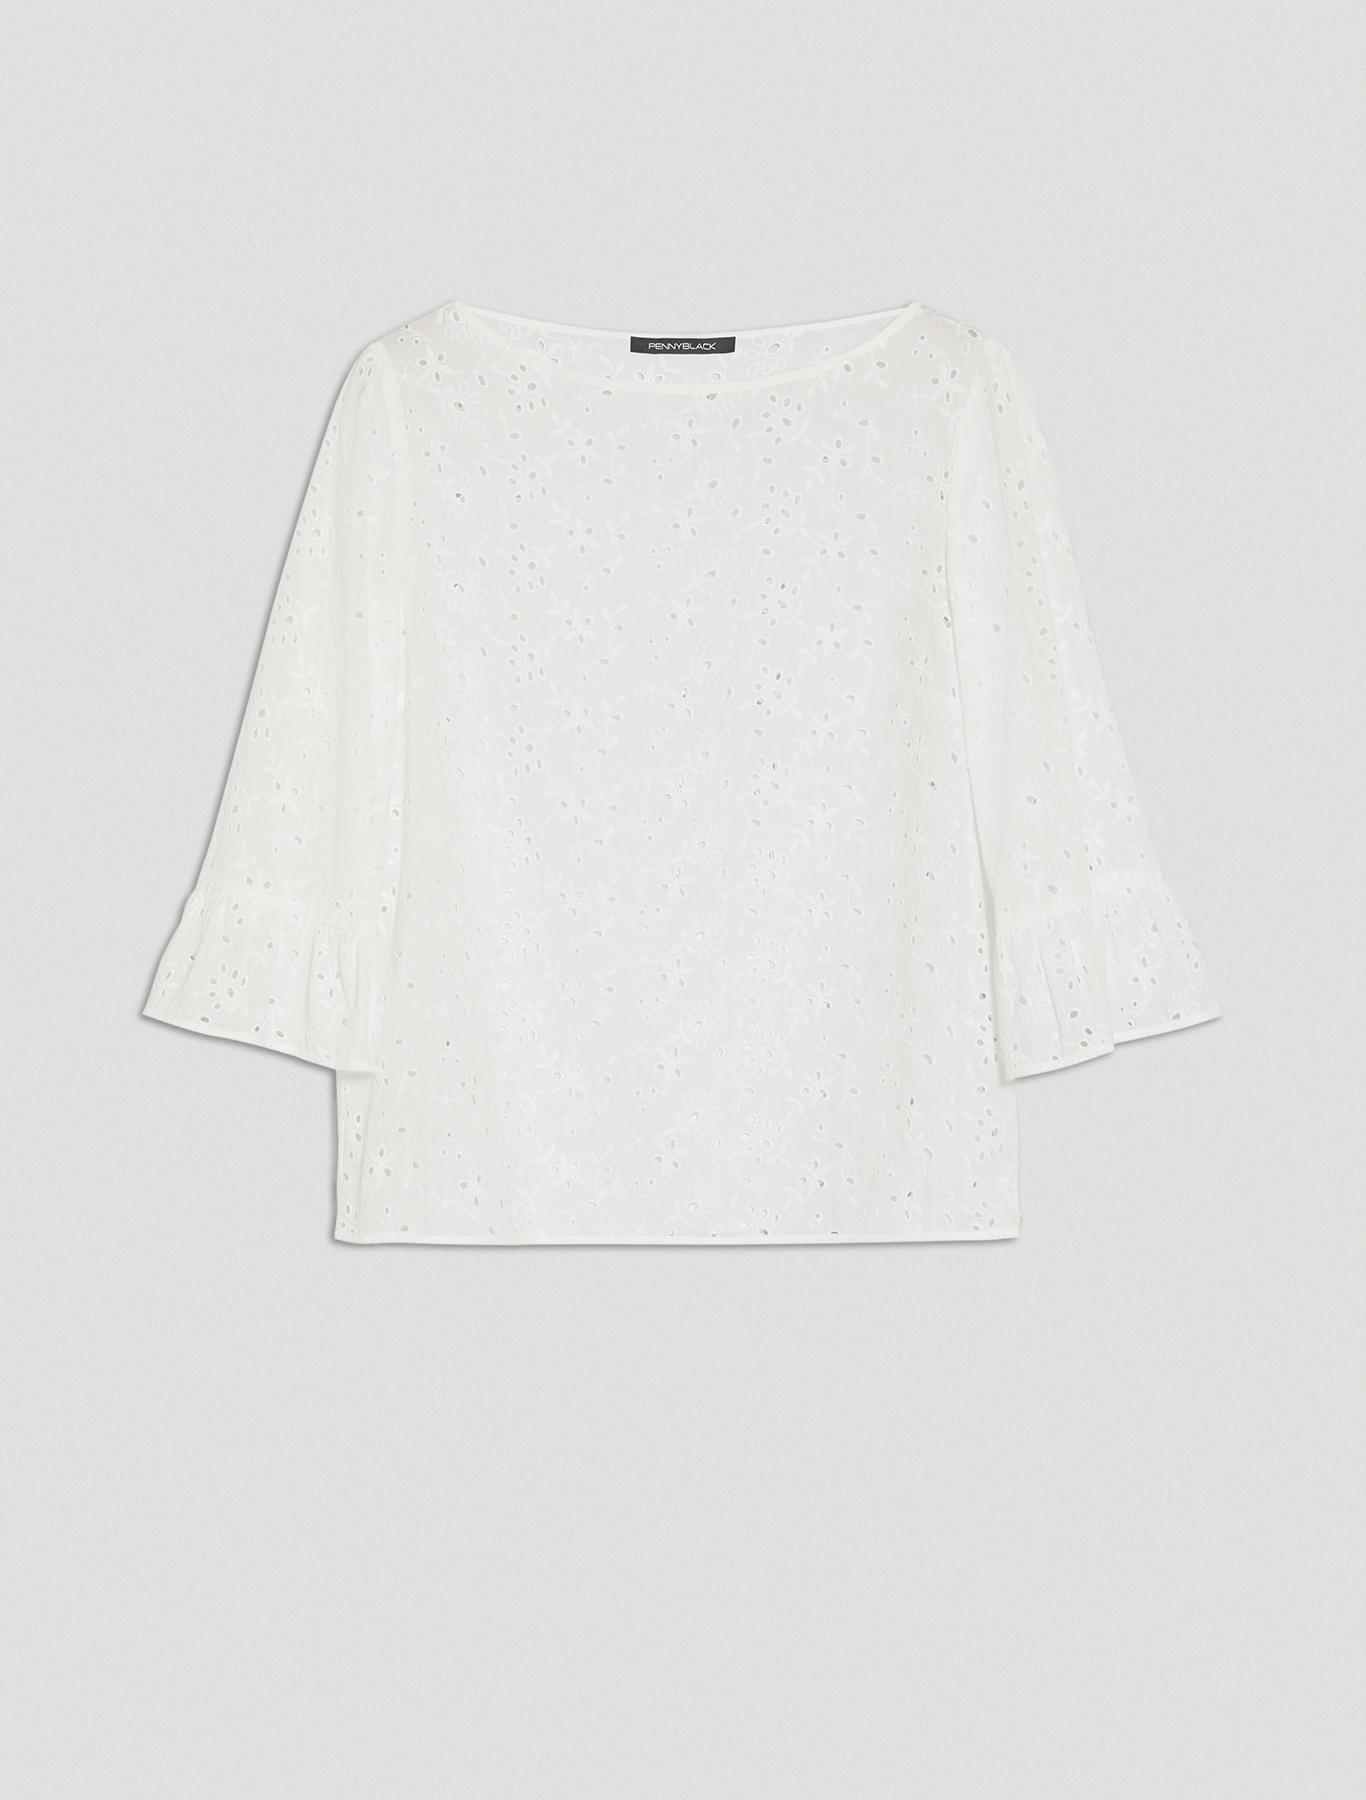 St. Gallen cotton blouse - white - pennyblack